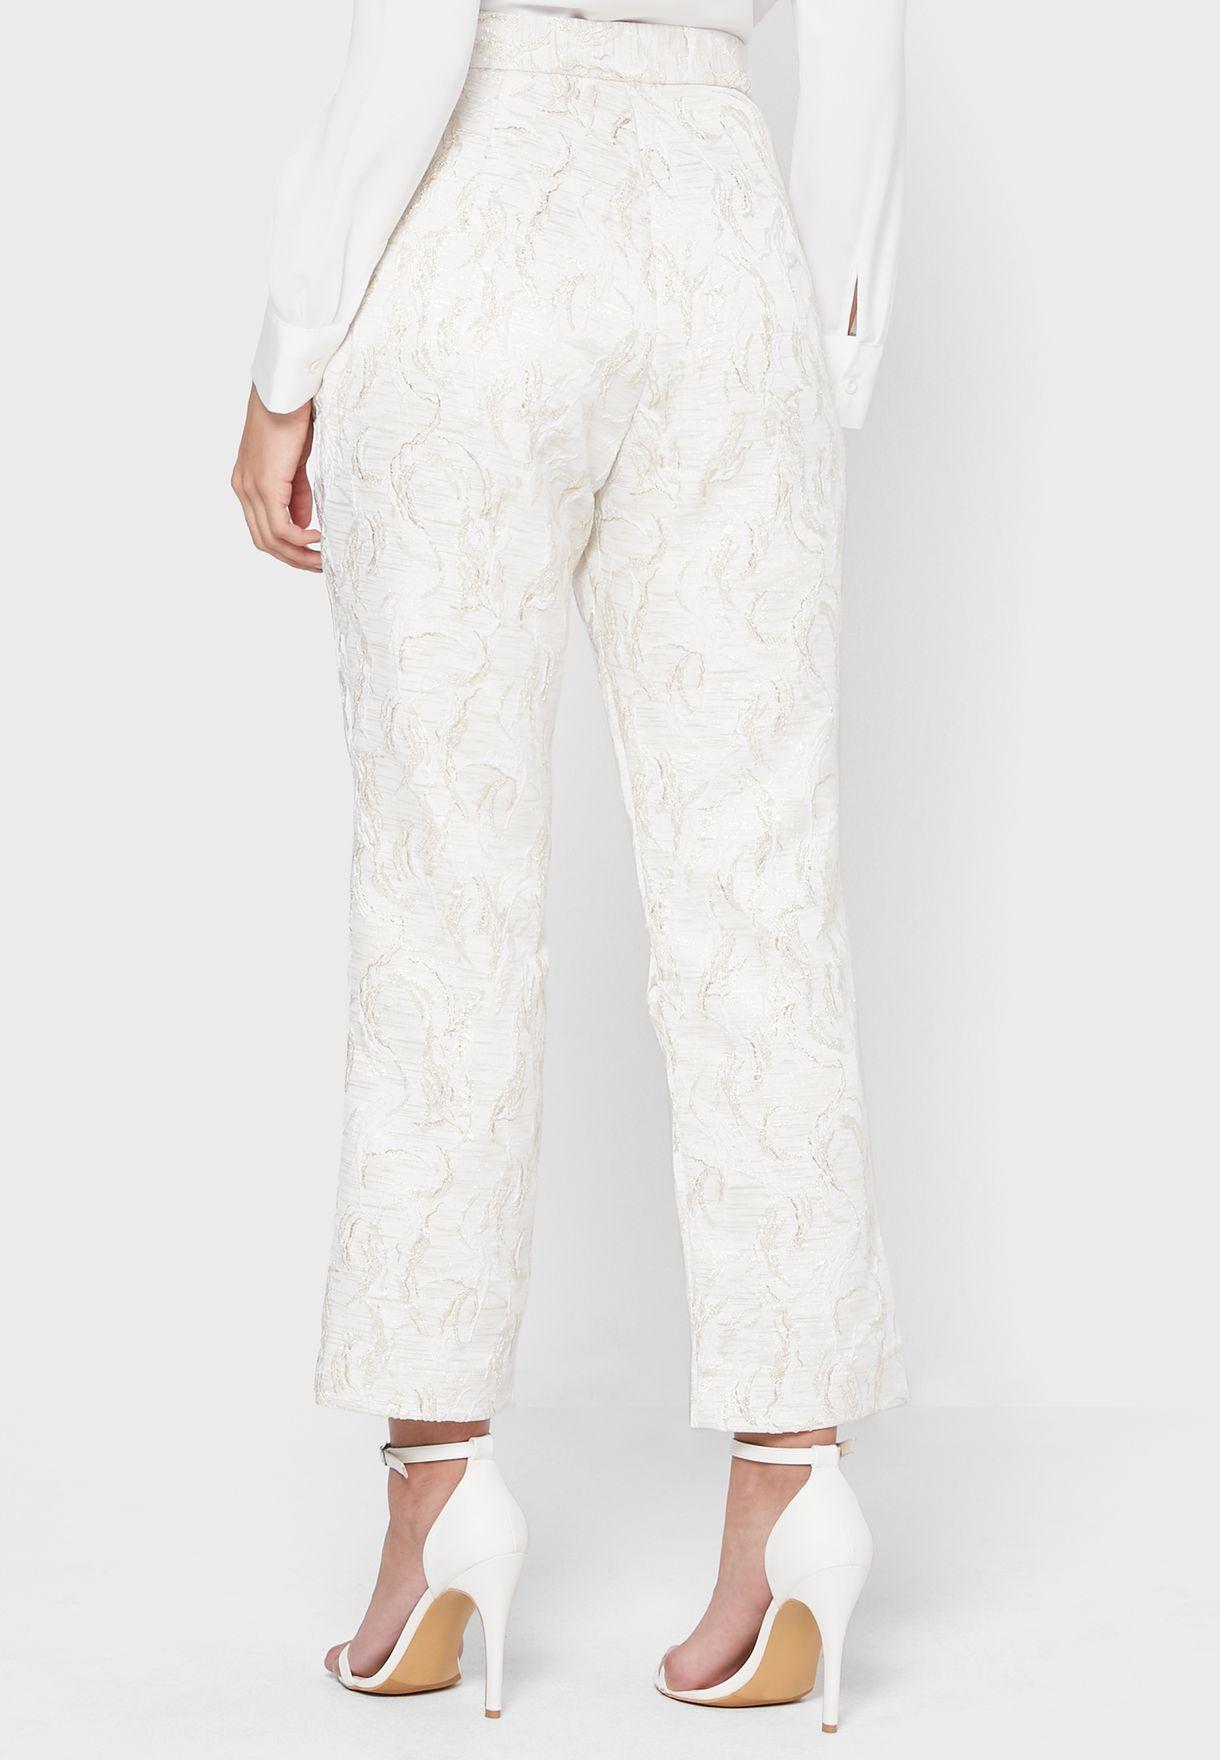 Ankle Grazer Printed Pants